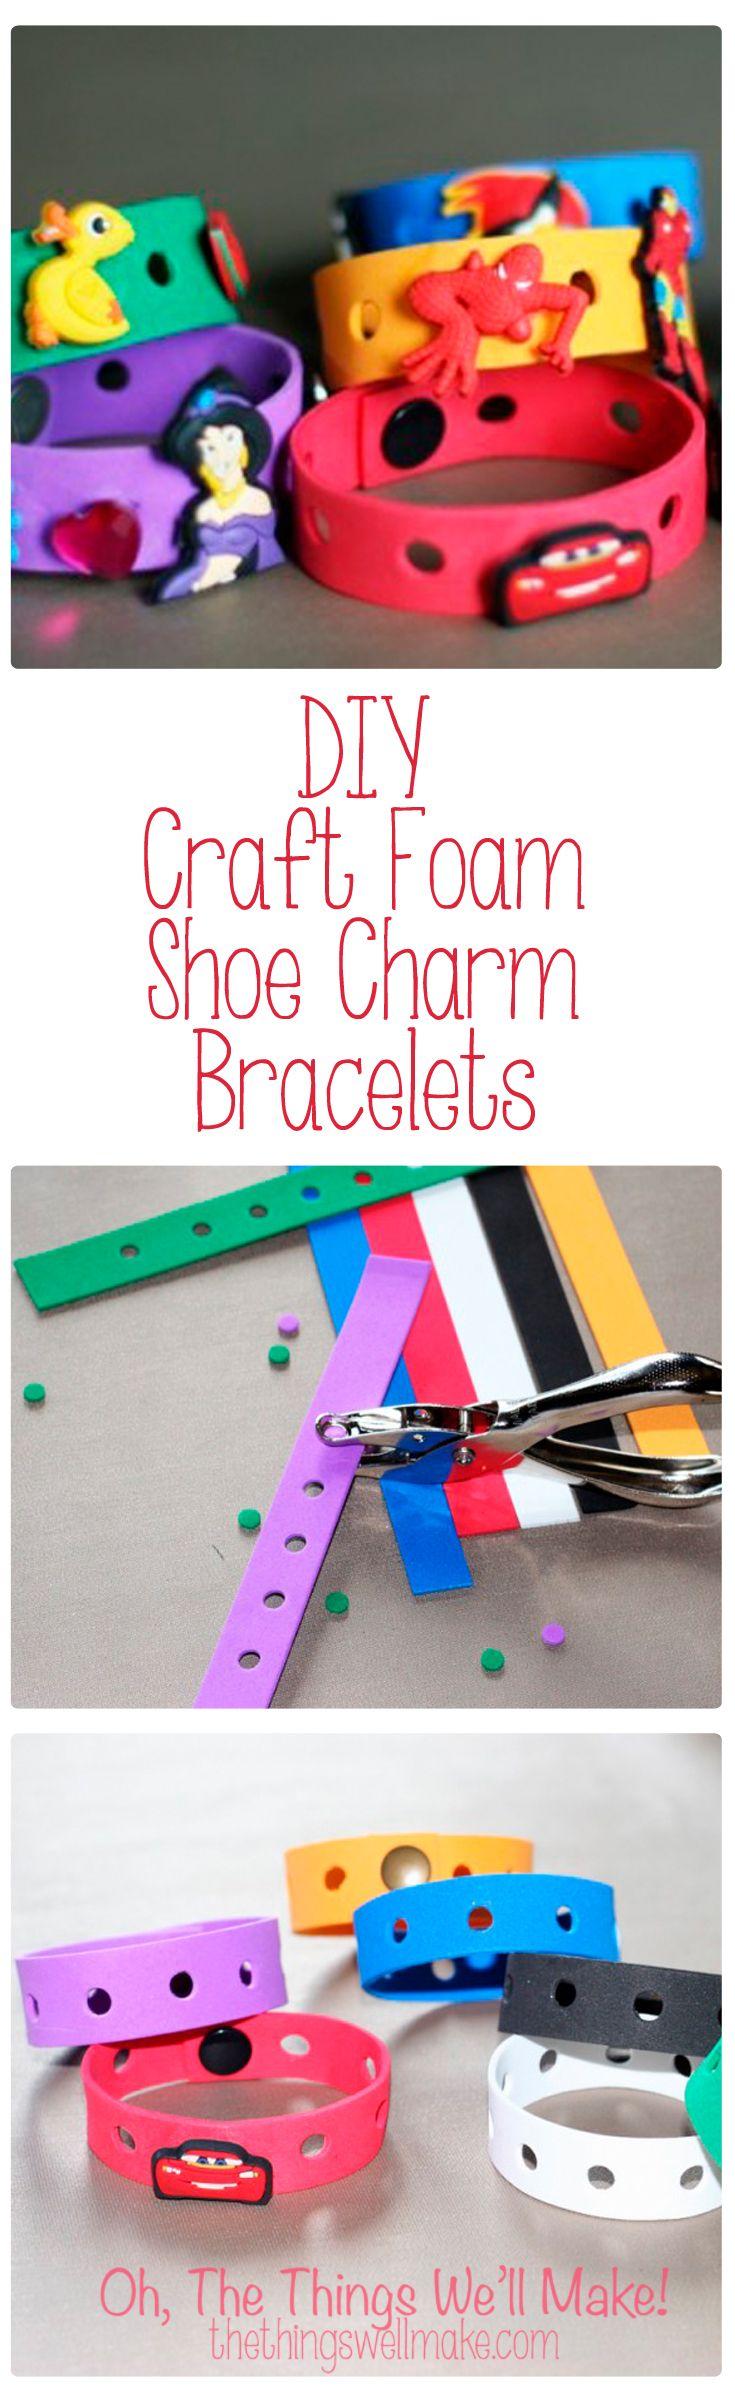 aa4aa25faae7d How to make craft foam shoe charm bracelets for showing off croc shoe charms